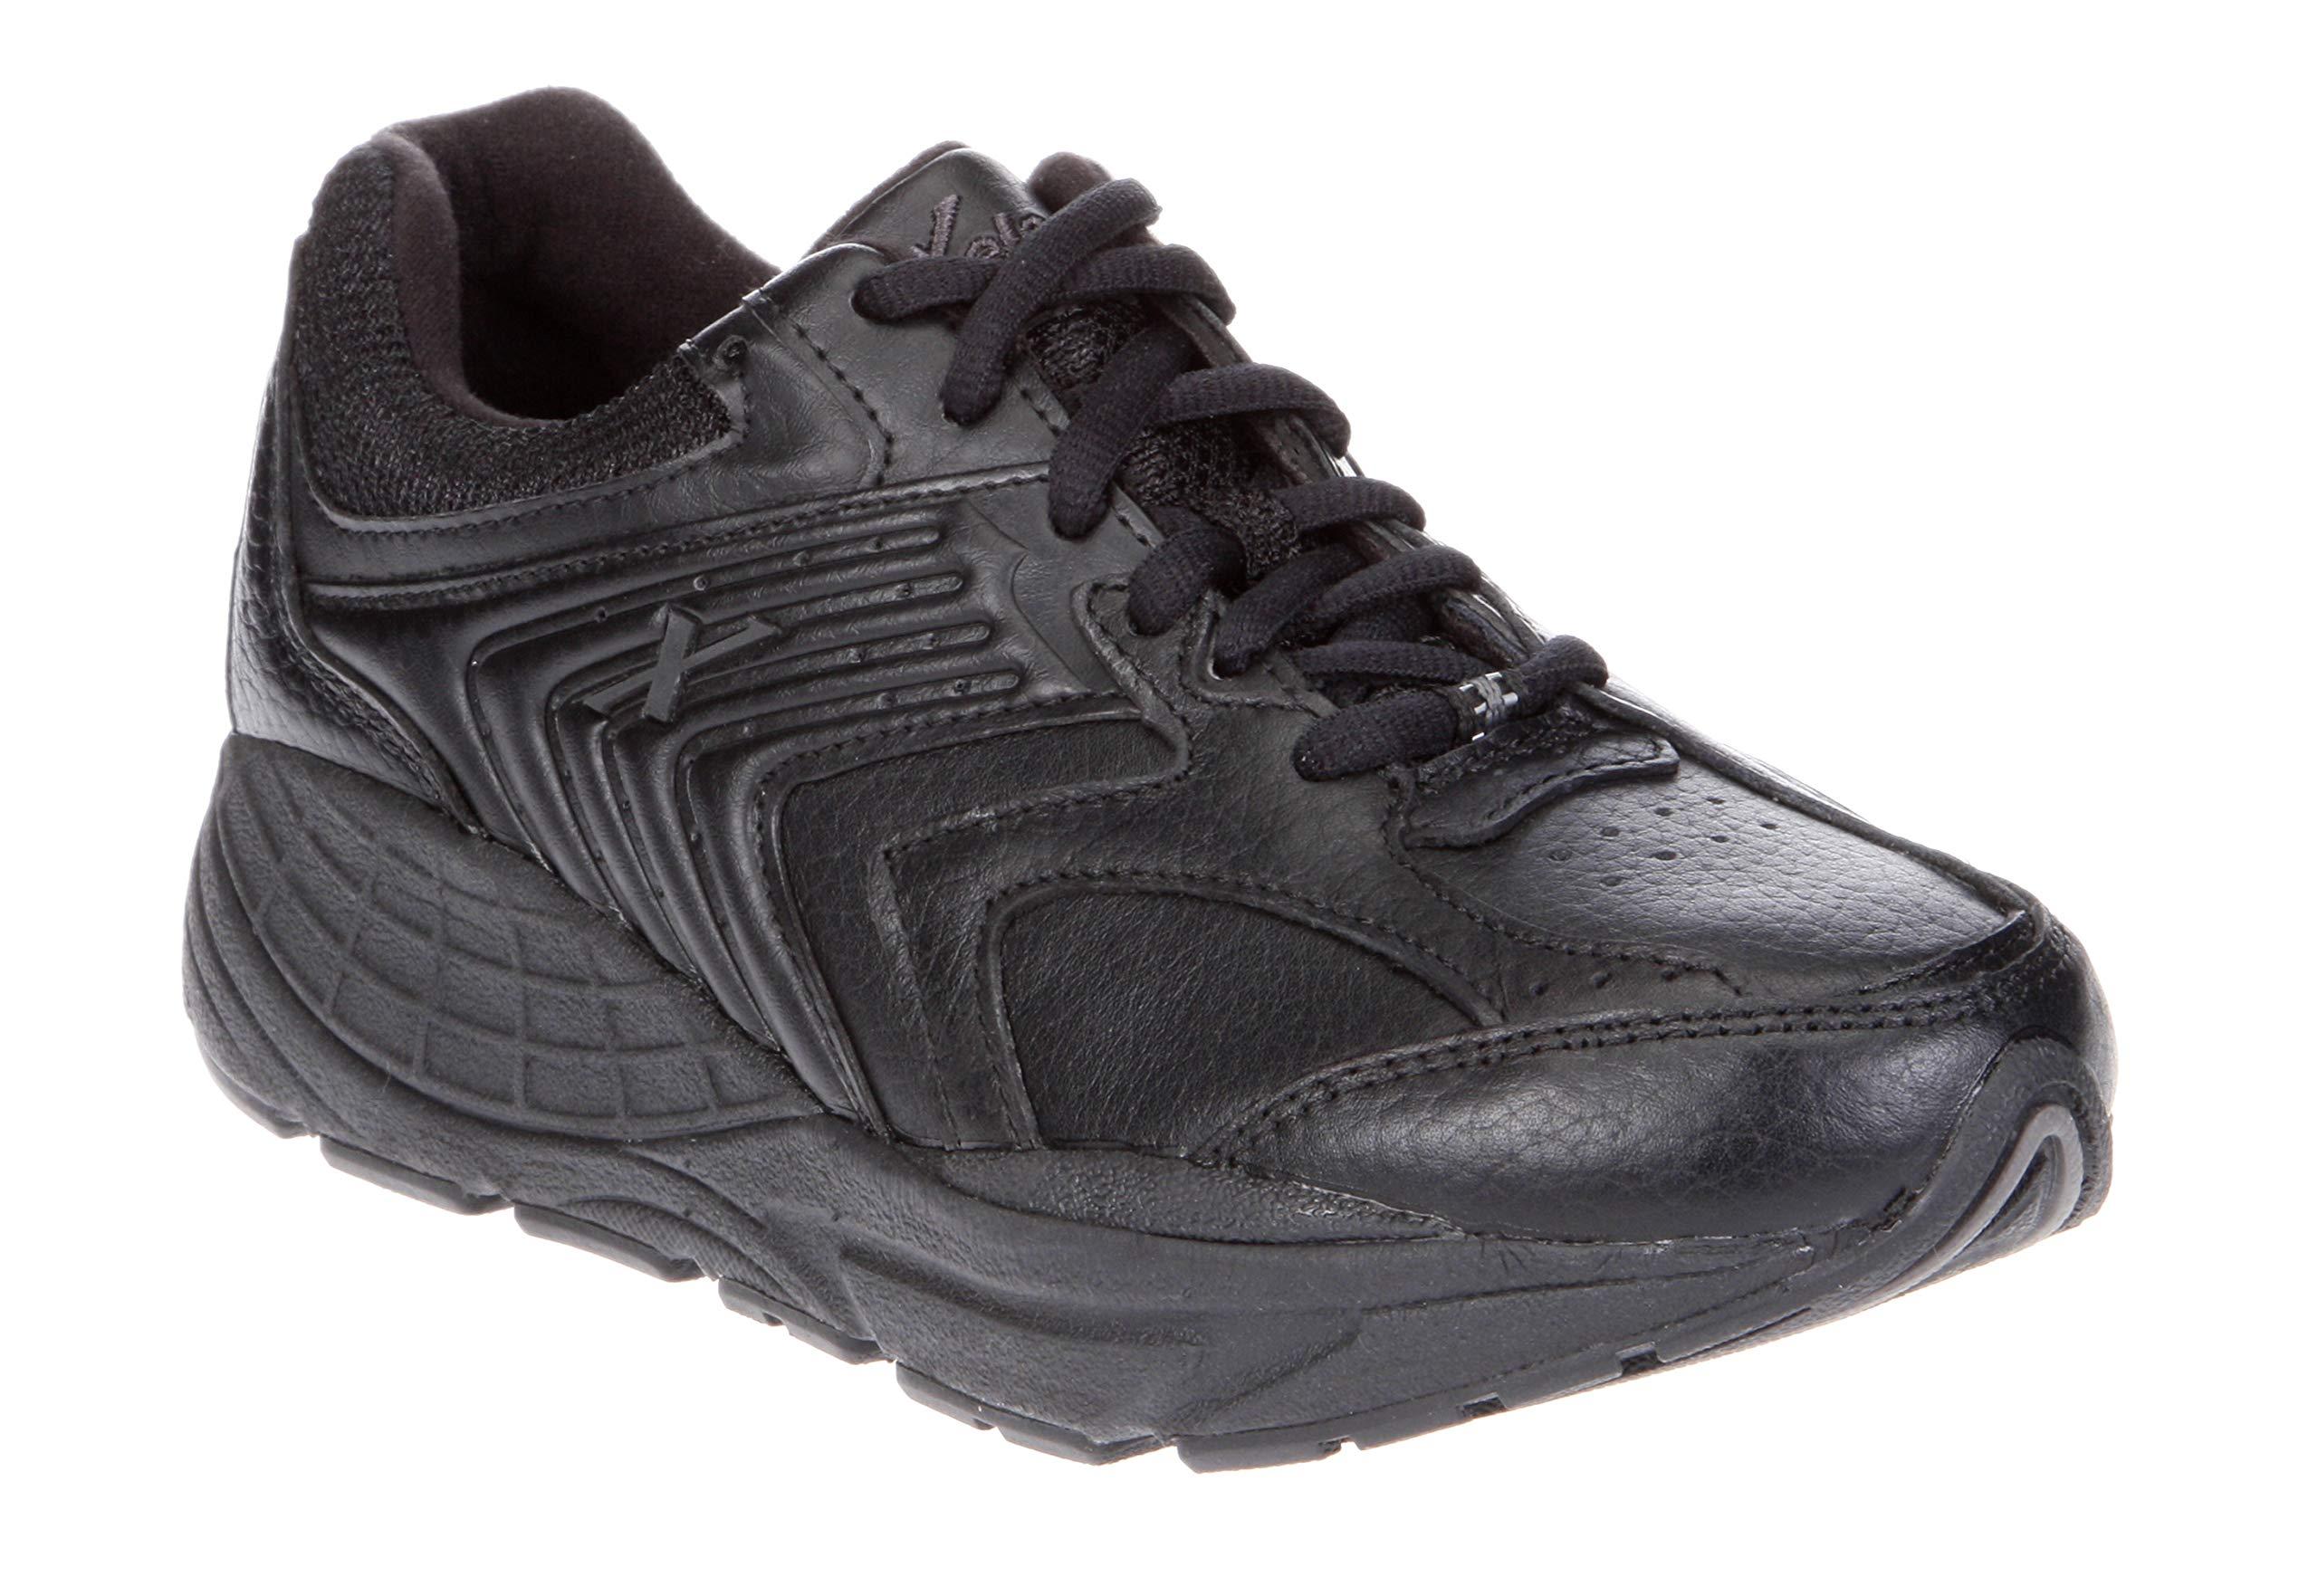 Xelero Matrix - Mens Motion Control Walking Shoe Black - 8 Medium